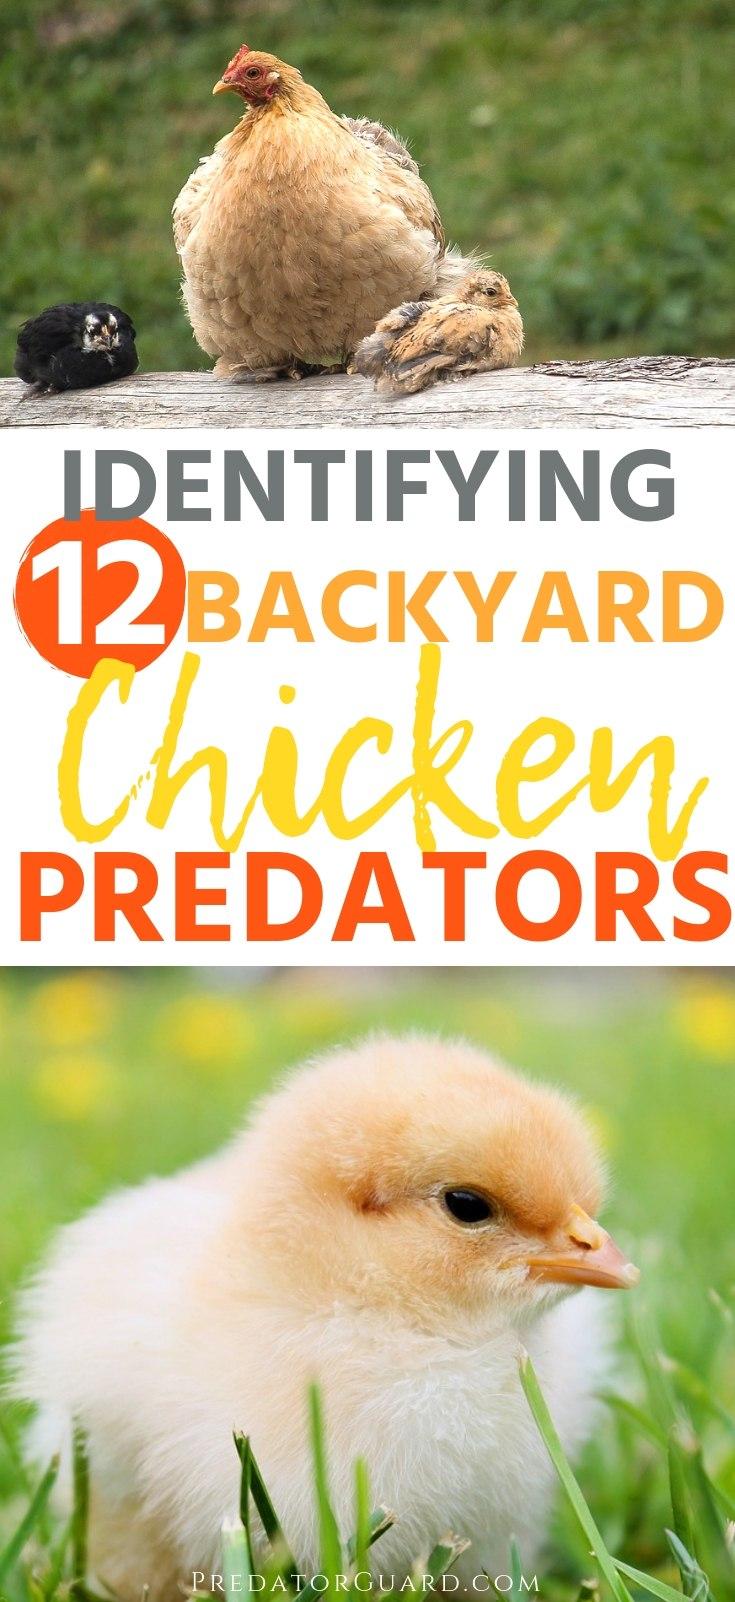 Identifying-12-Backyard-Chicken-Predators-Predator-Guard